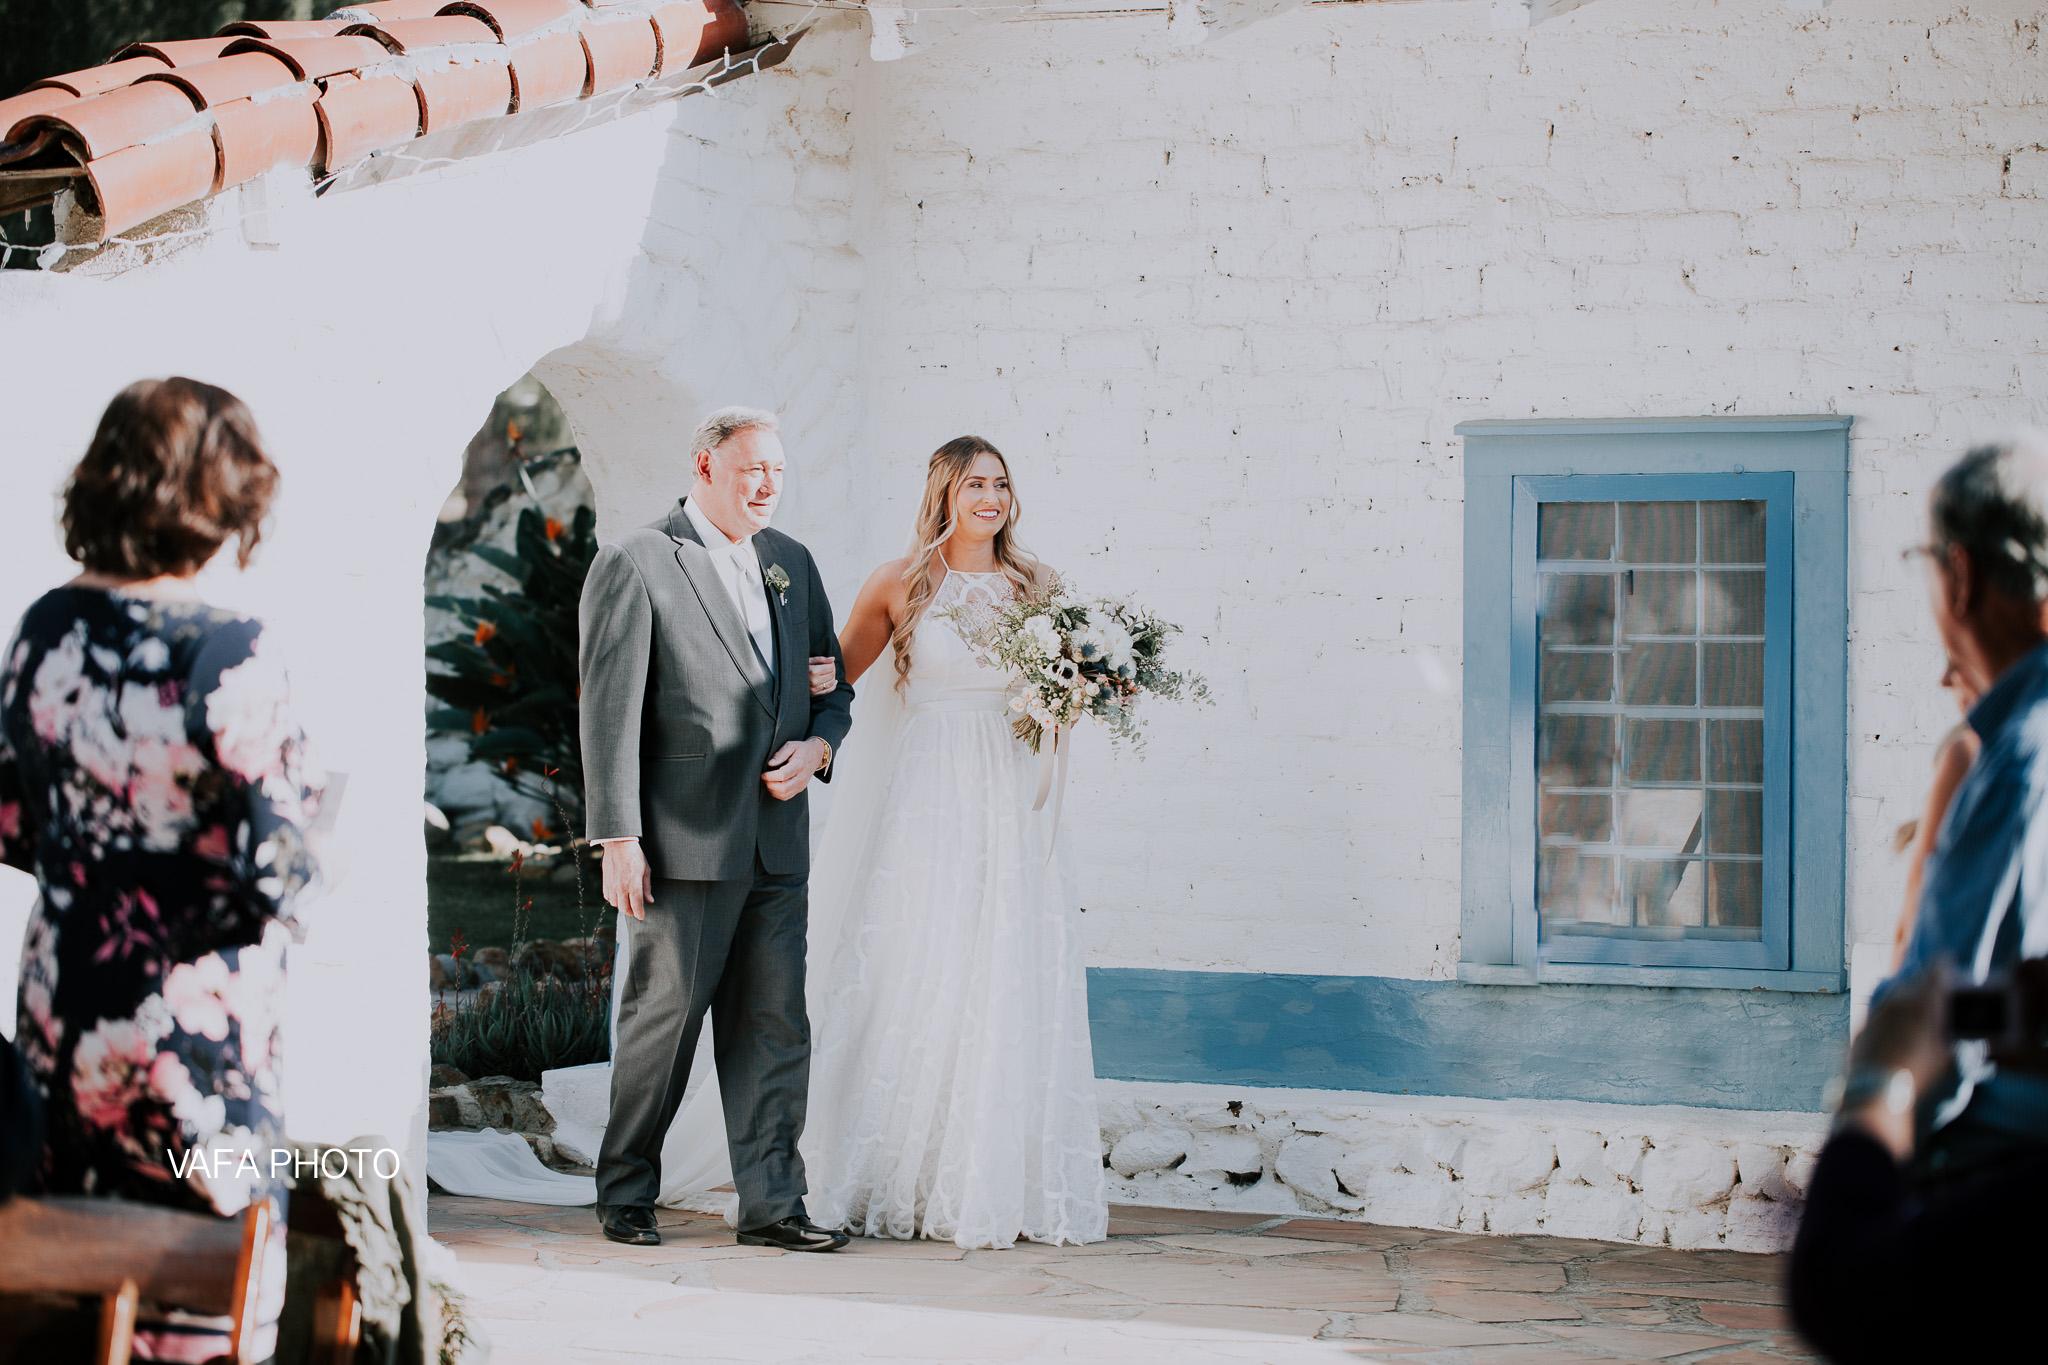 Leo-Carrillo-Ranch-Wedding-Lauren-Mike-Vafa-Photo-544.jpg